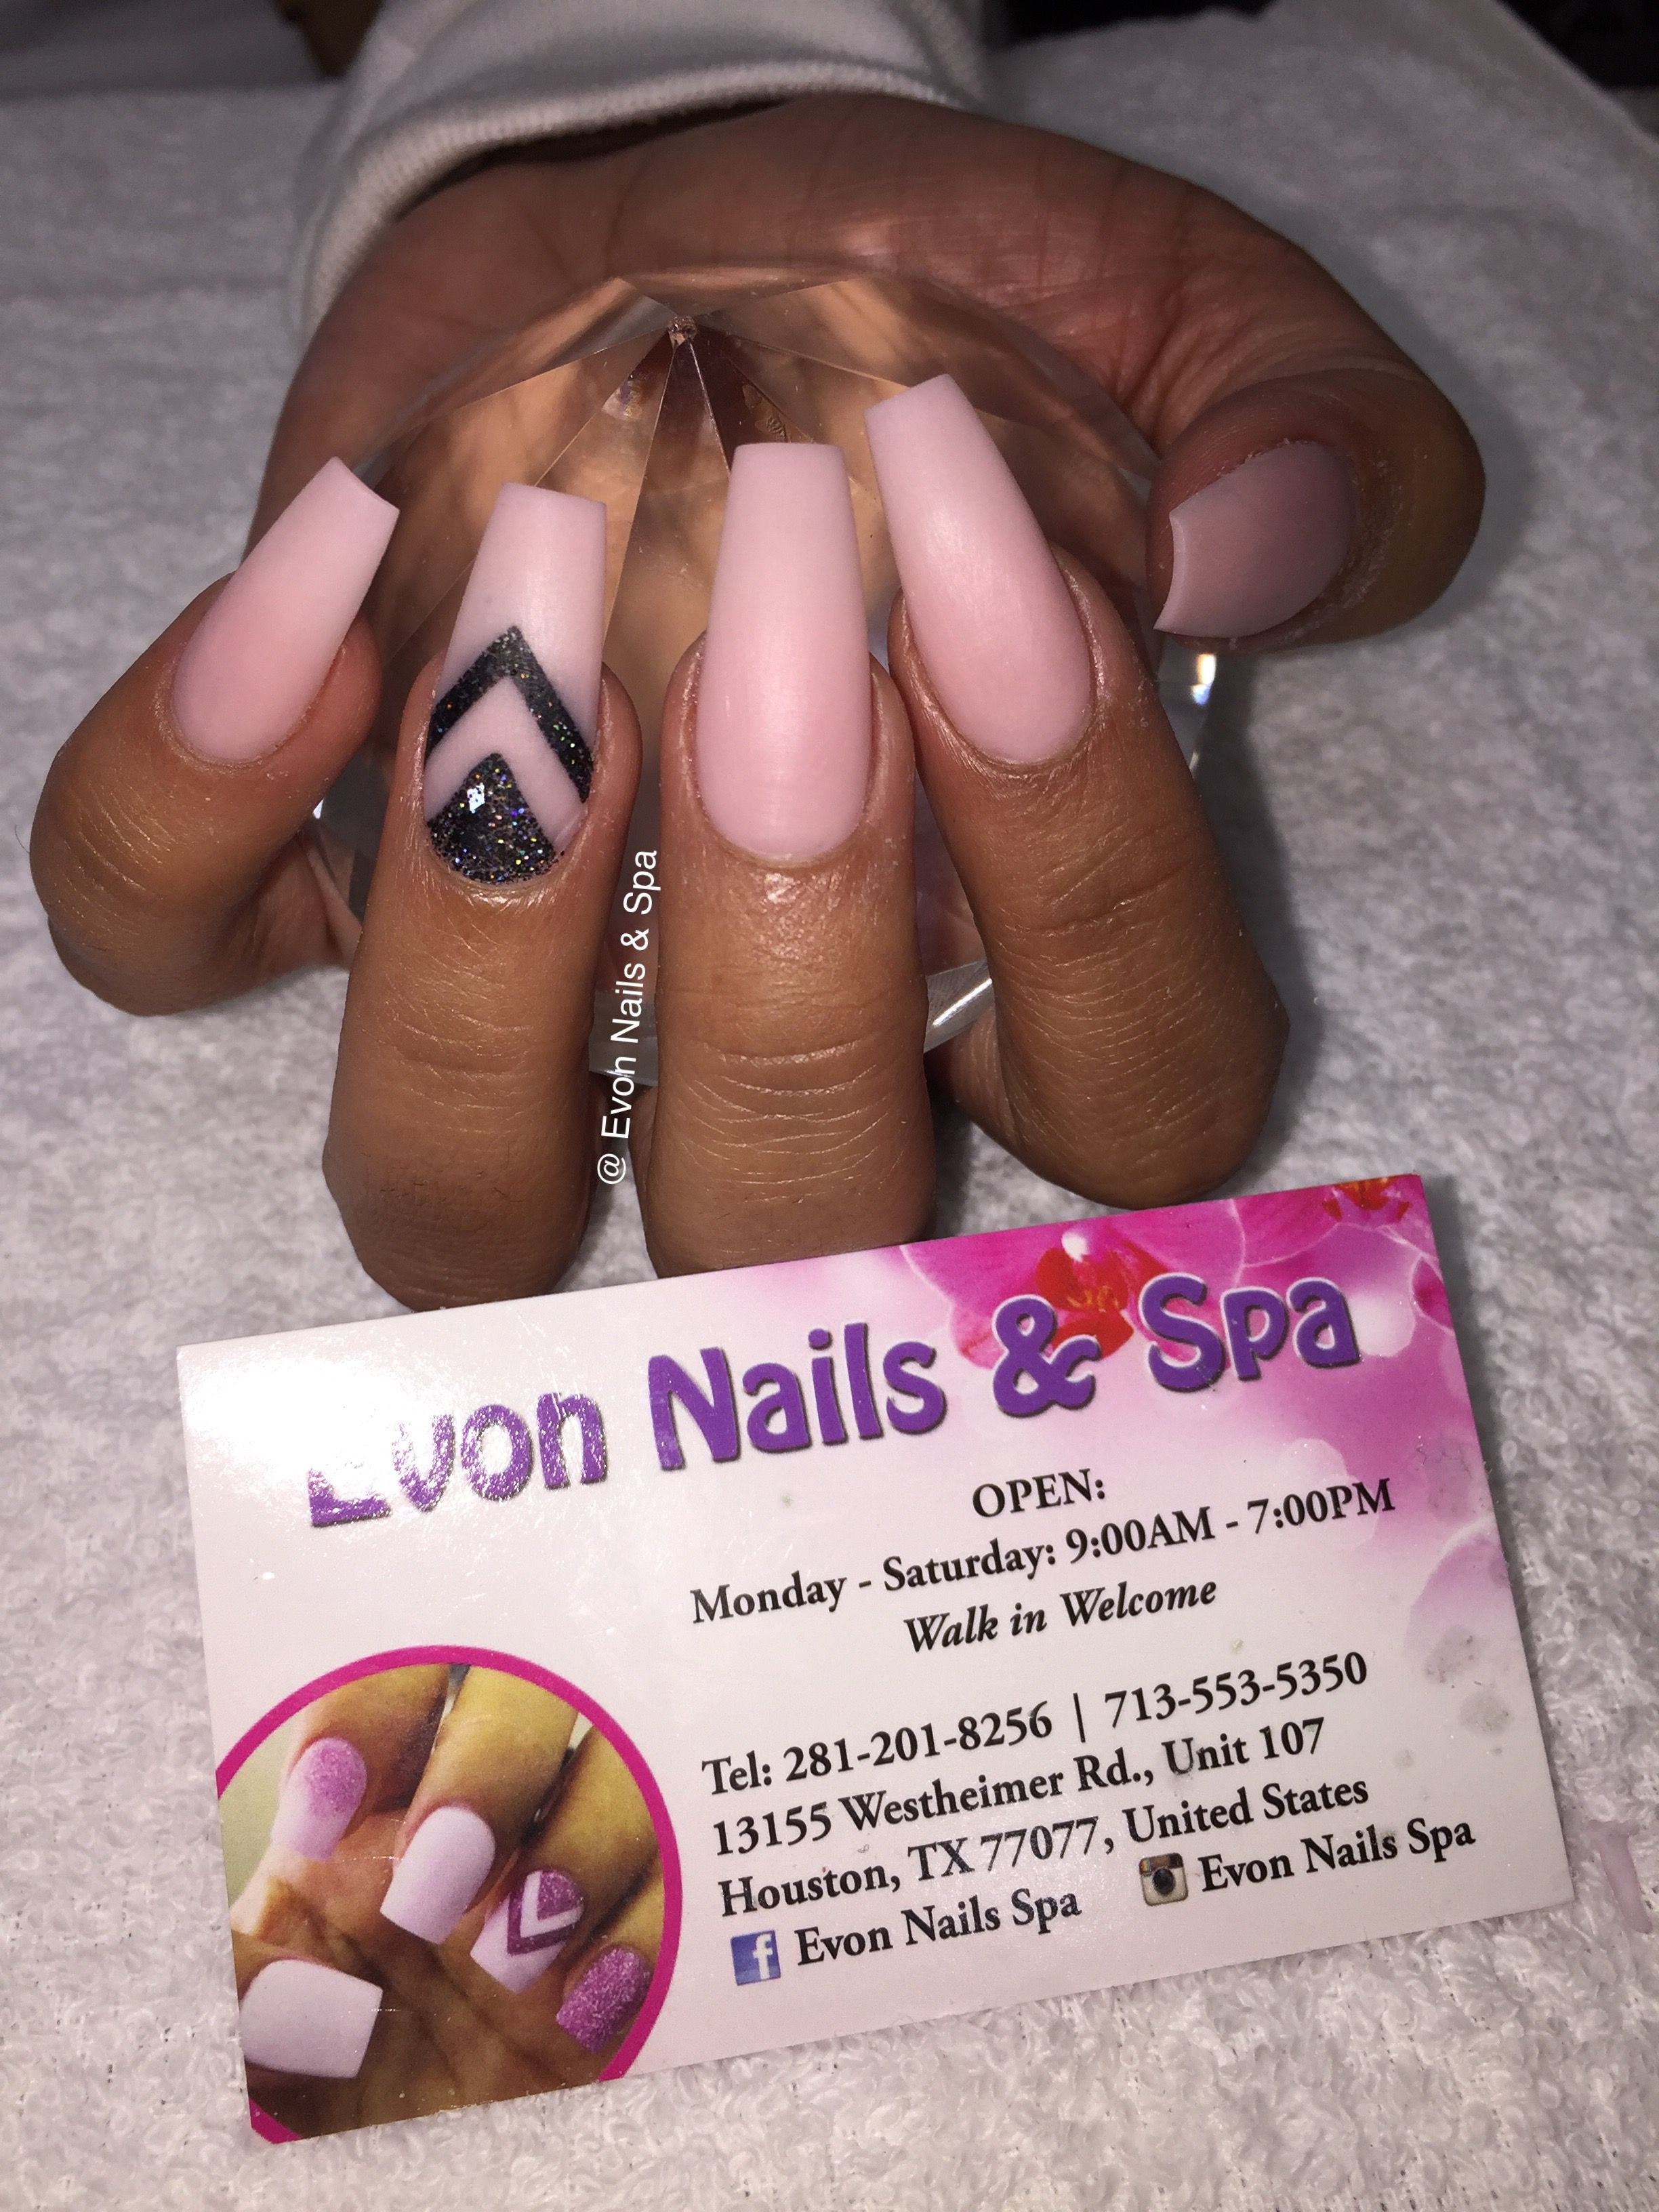 Pin by Evon Nails & Spa on Evon nails & spa | Pinterest | Nail spa ...